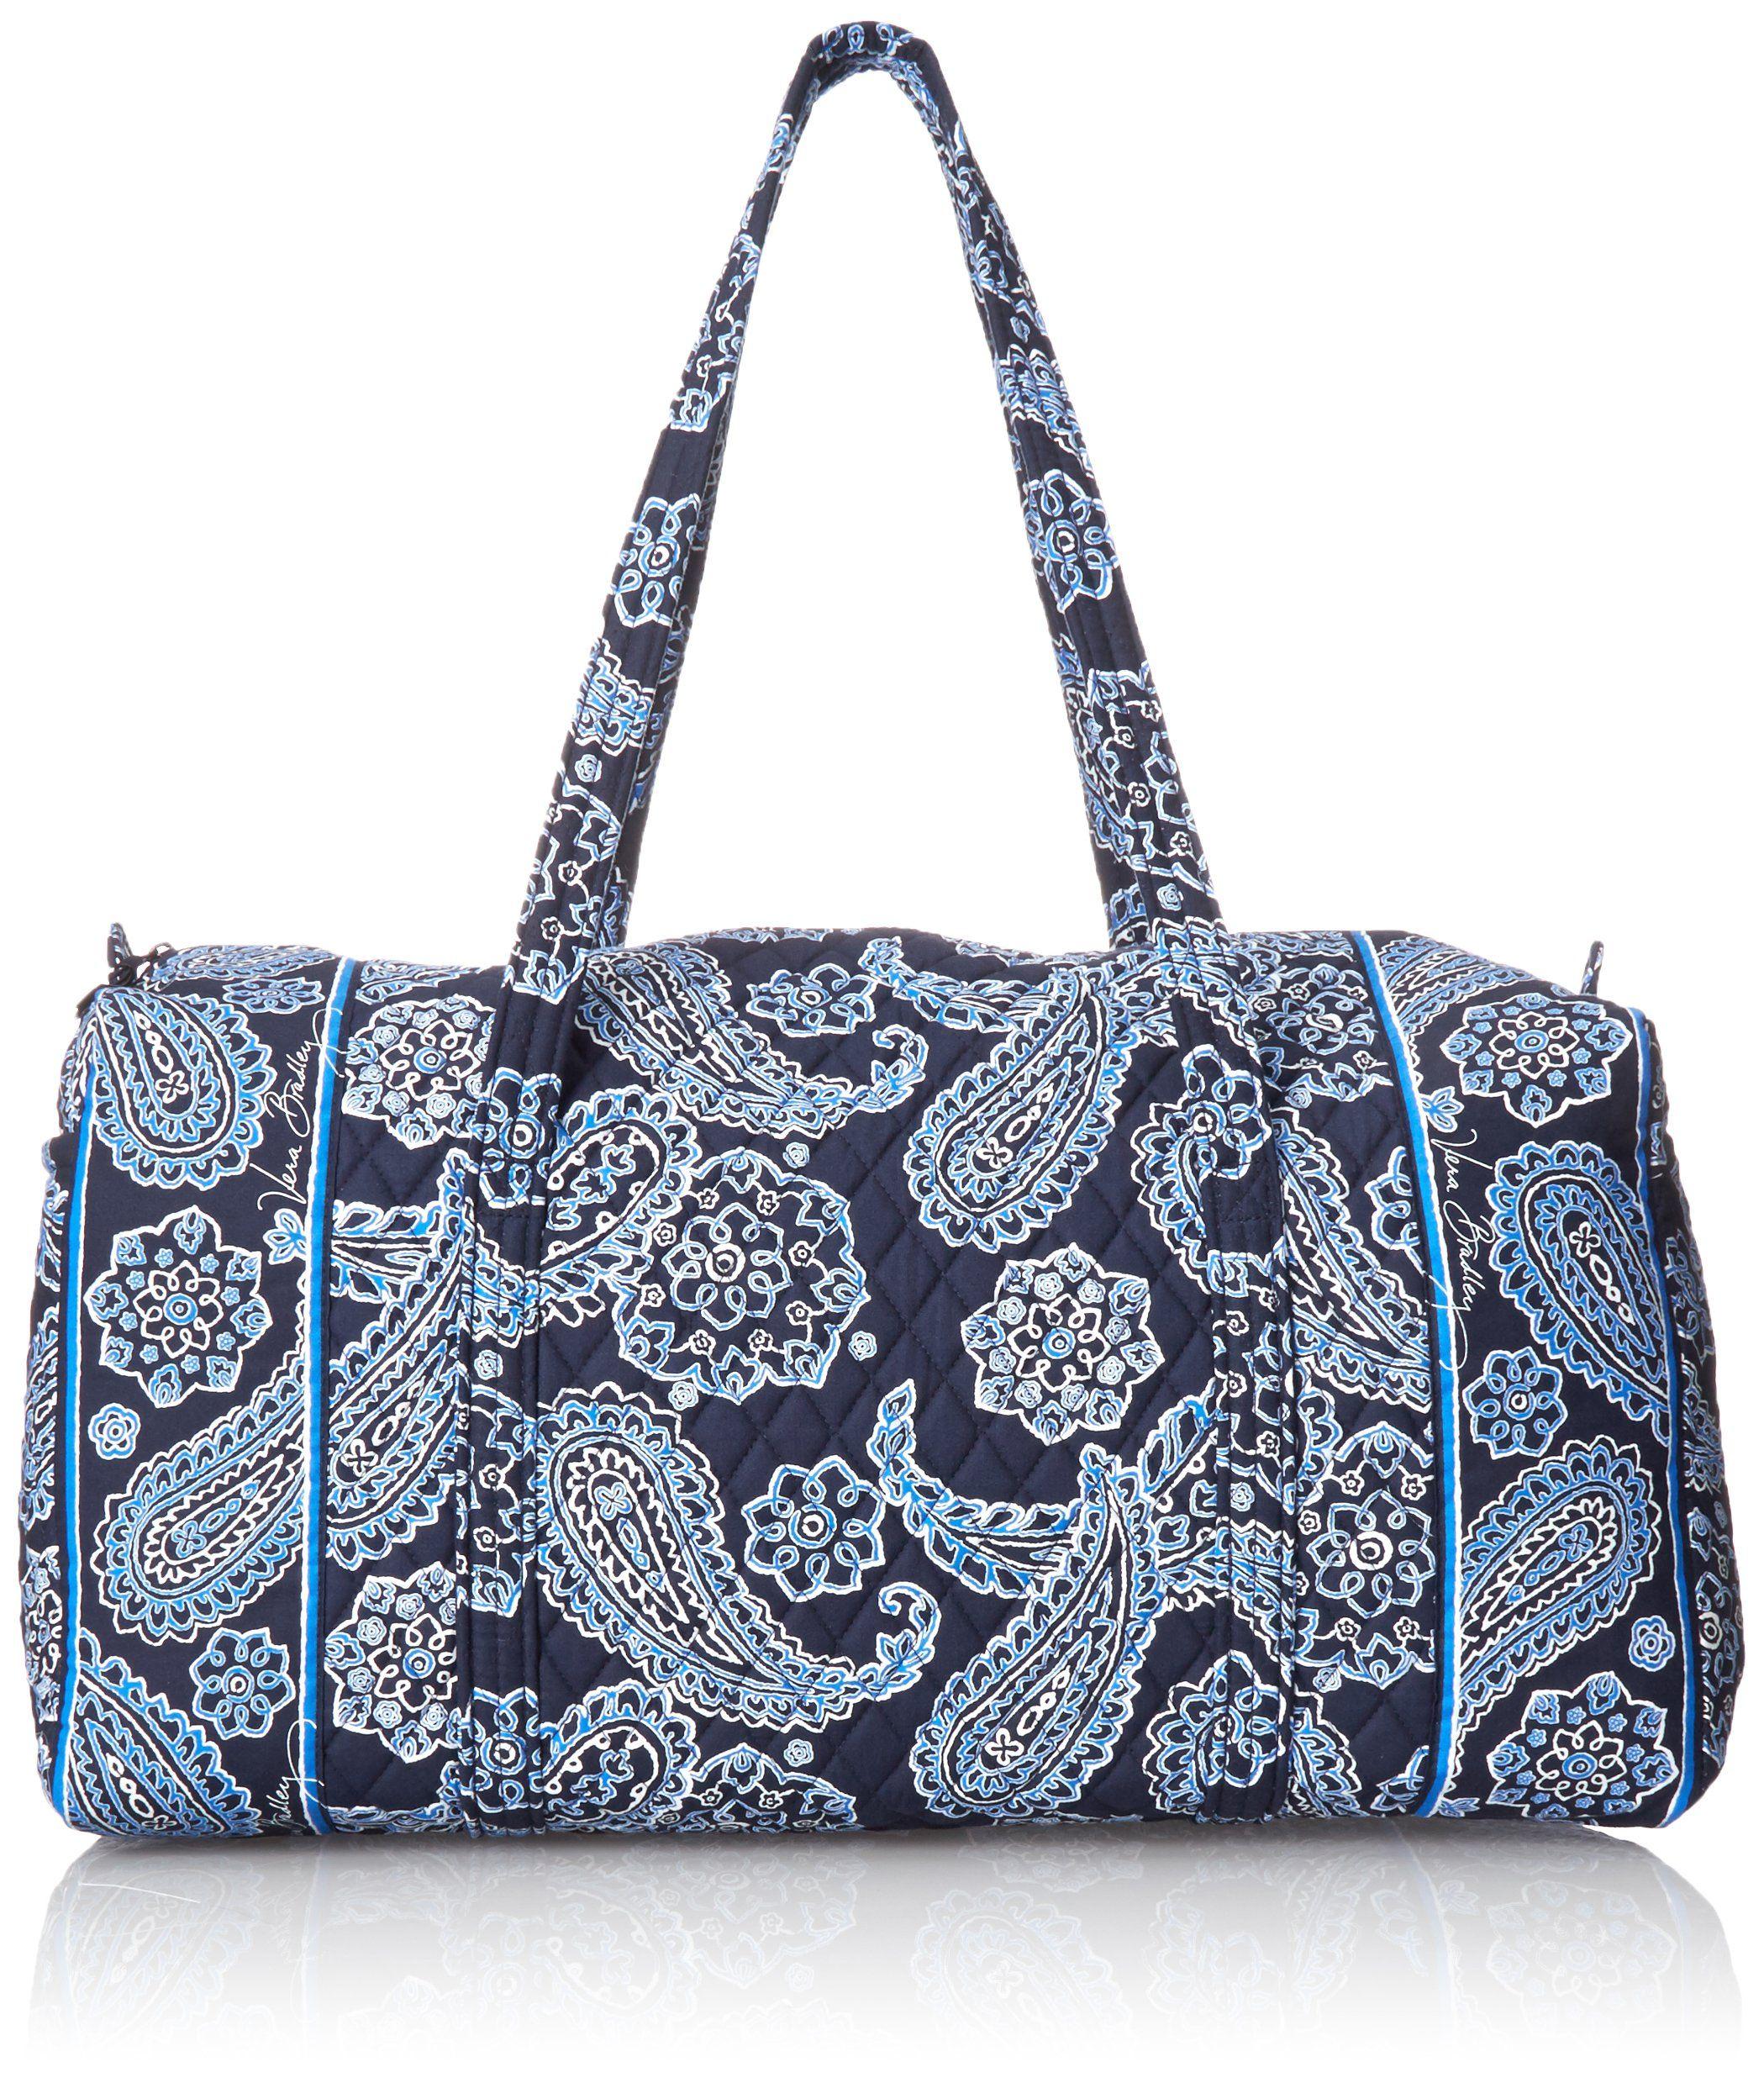 f8860ea855f6 Vera Bradley Duffle Bag